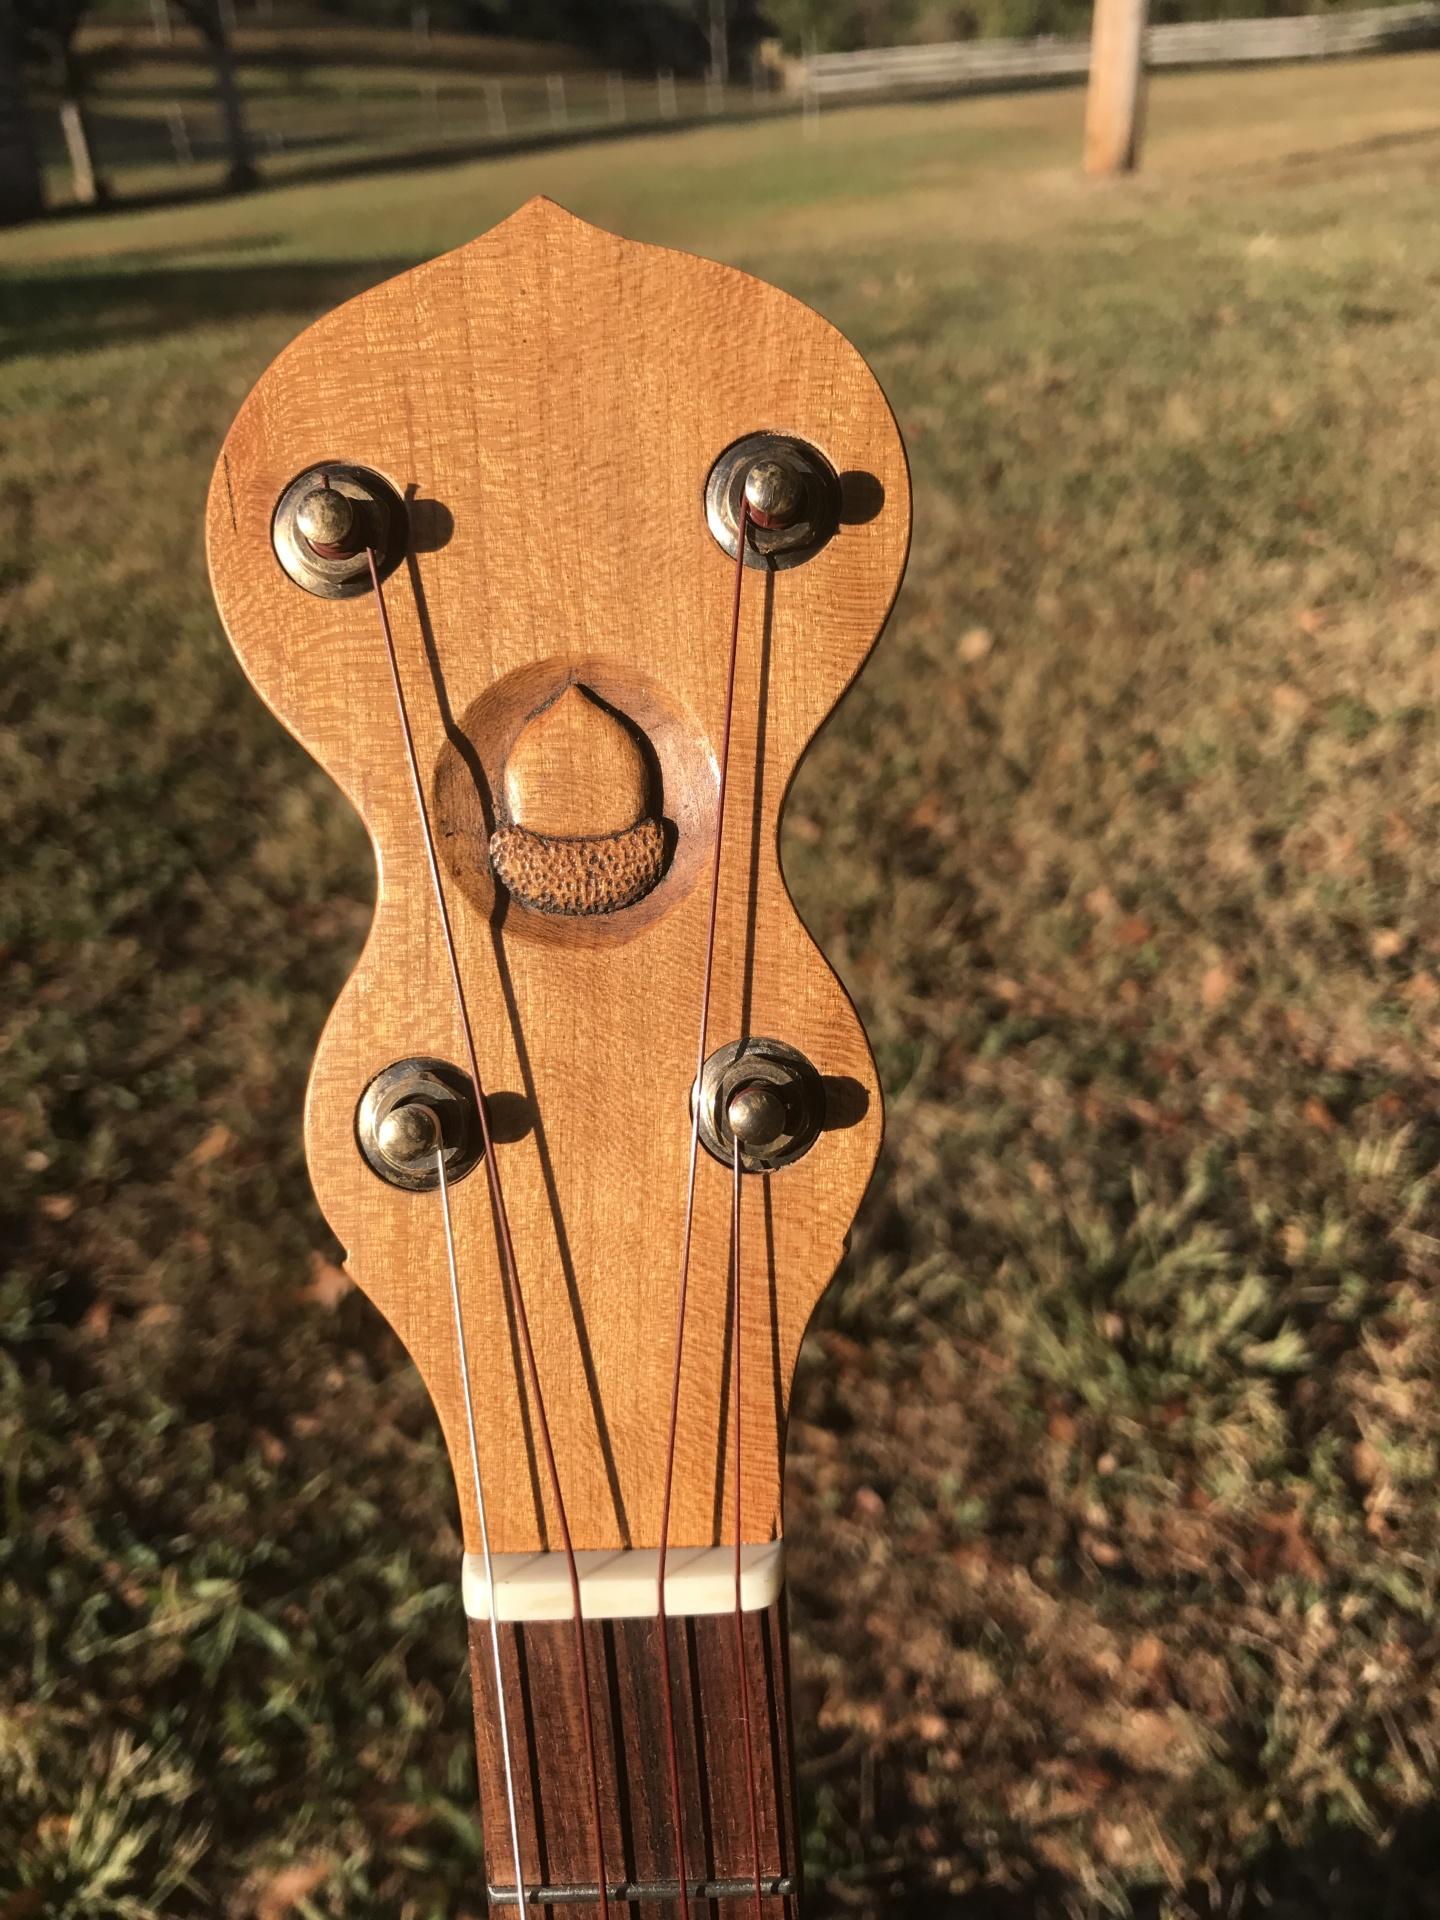 Banjo Ramblings